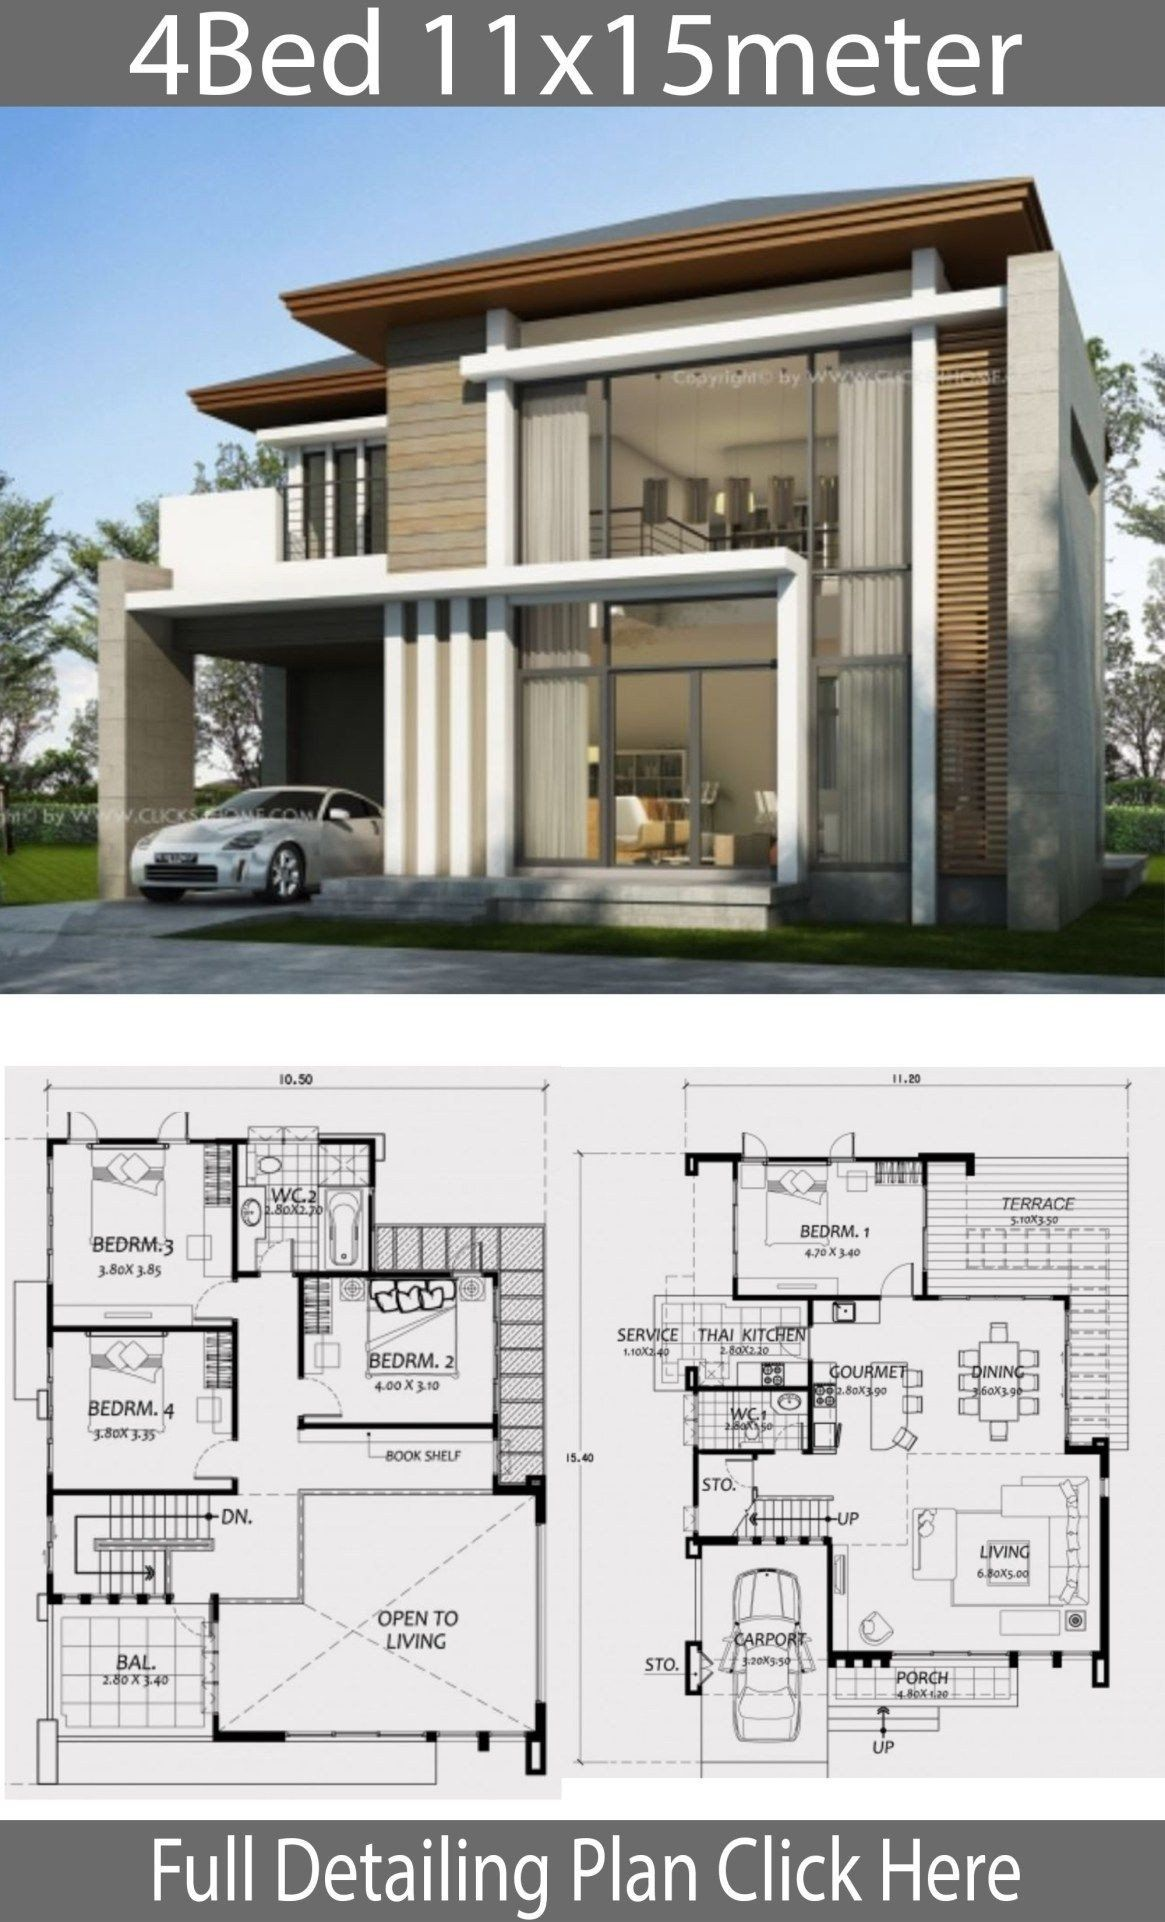 4 Bedroom Bungalow Architectural Design Sukro Info In 2020 Architectural House Plans Bungalow House Design Duplex House Design